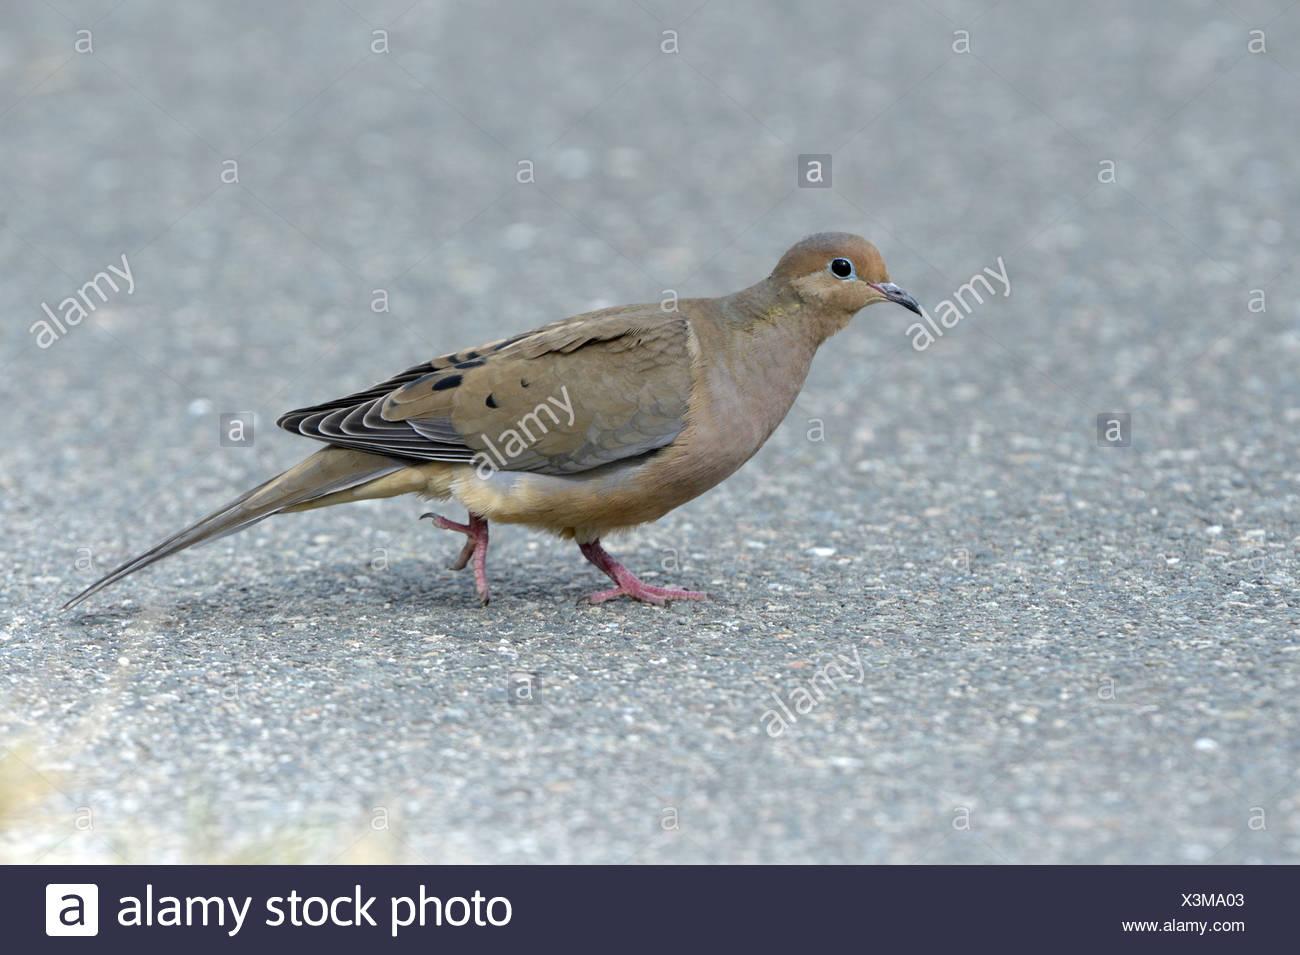 Mourning Dove - Zenaida macroura - 1st winter - Stock Image